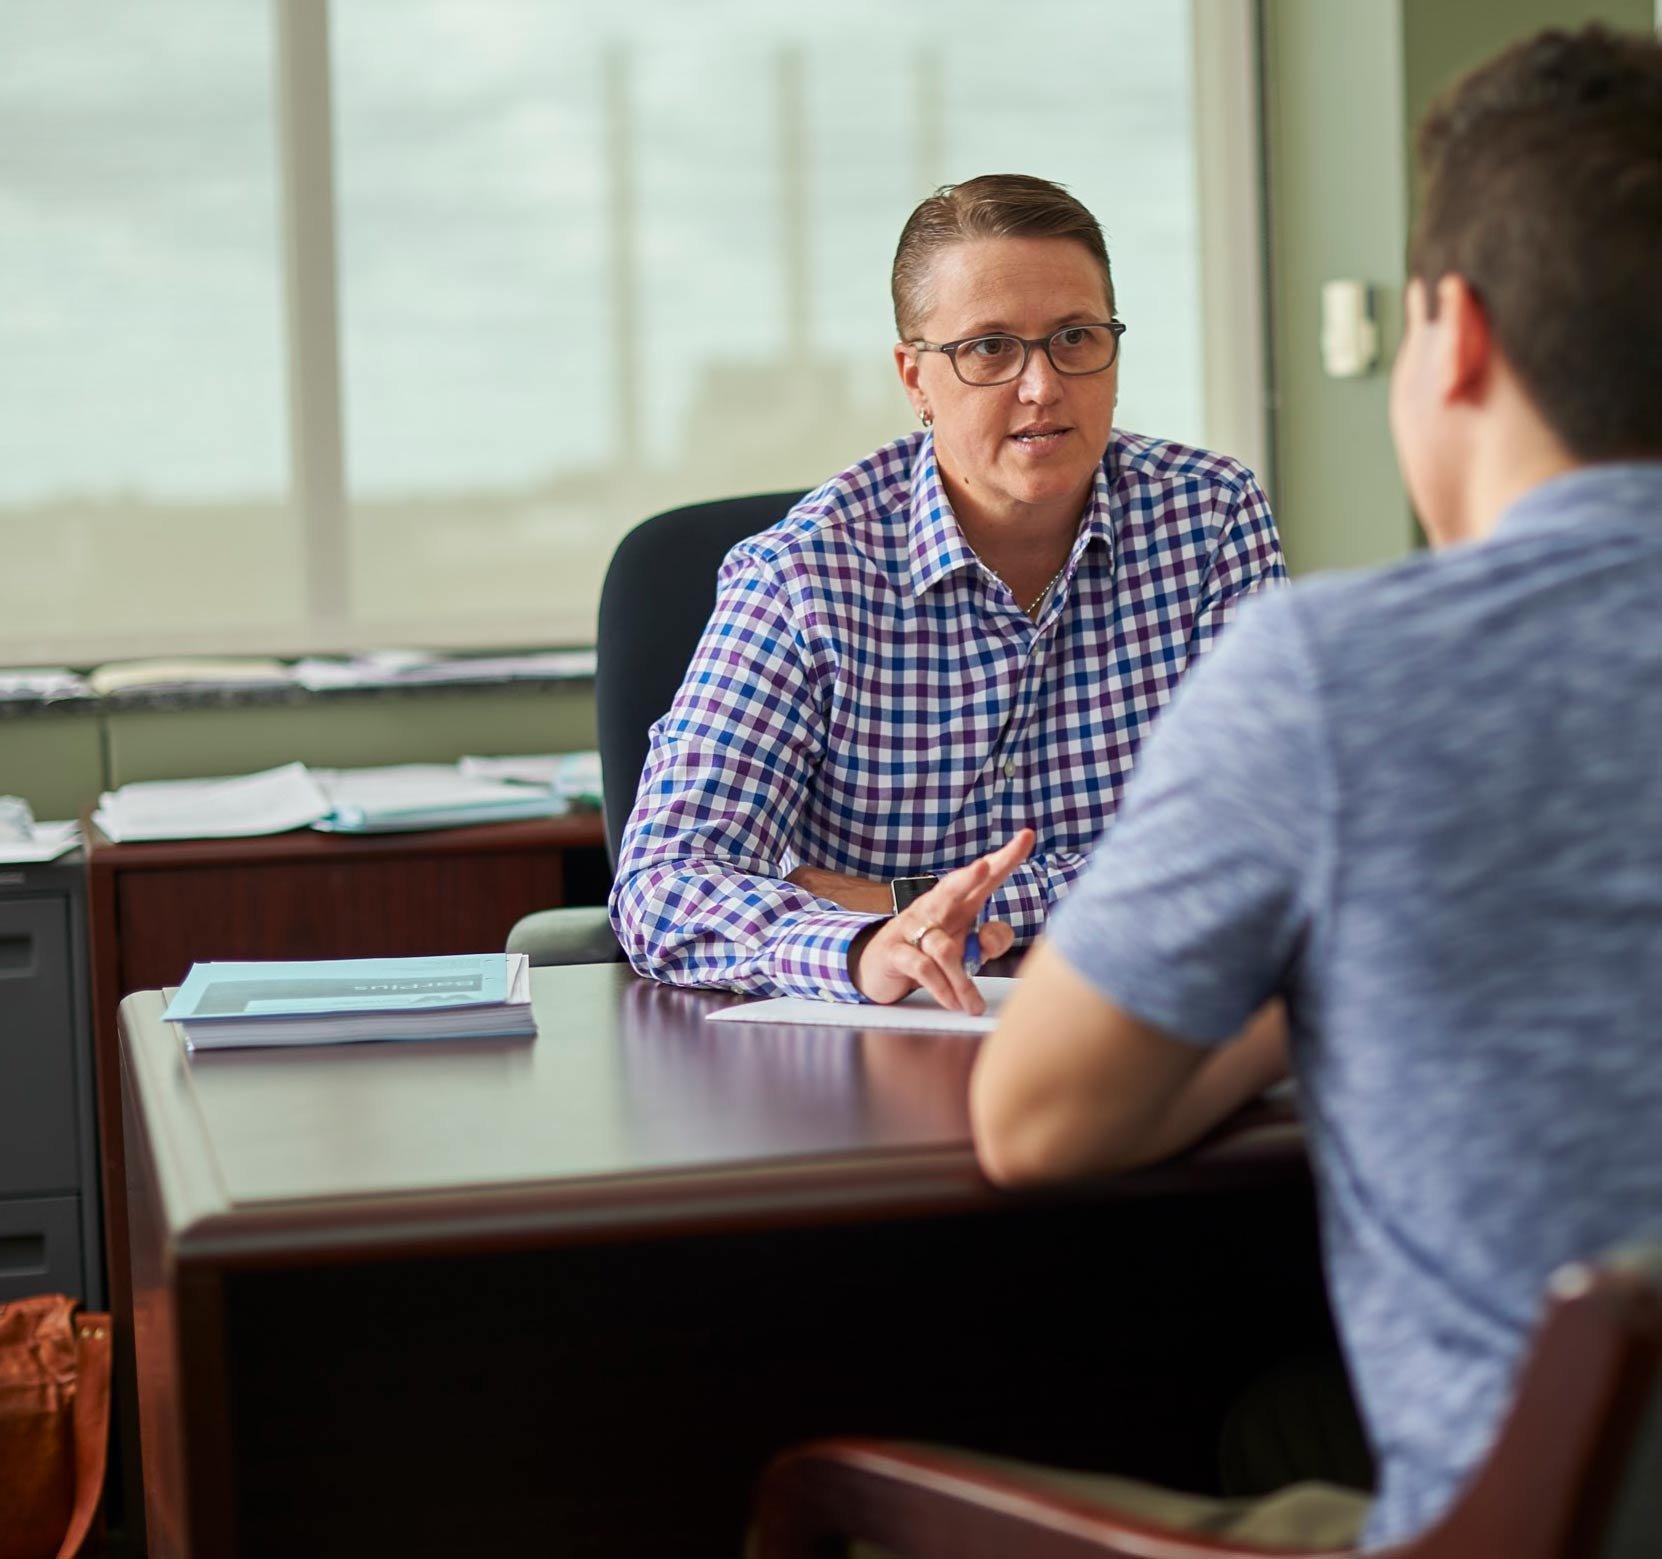 Student speaking to advisor